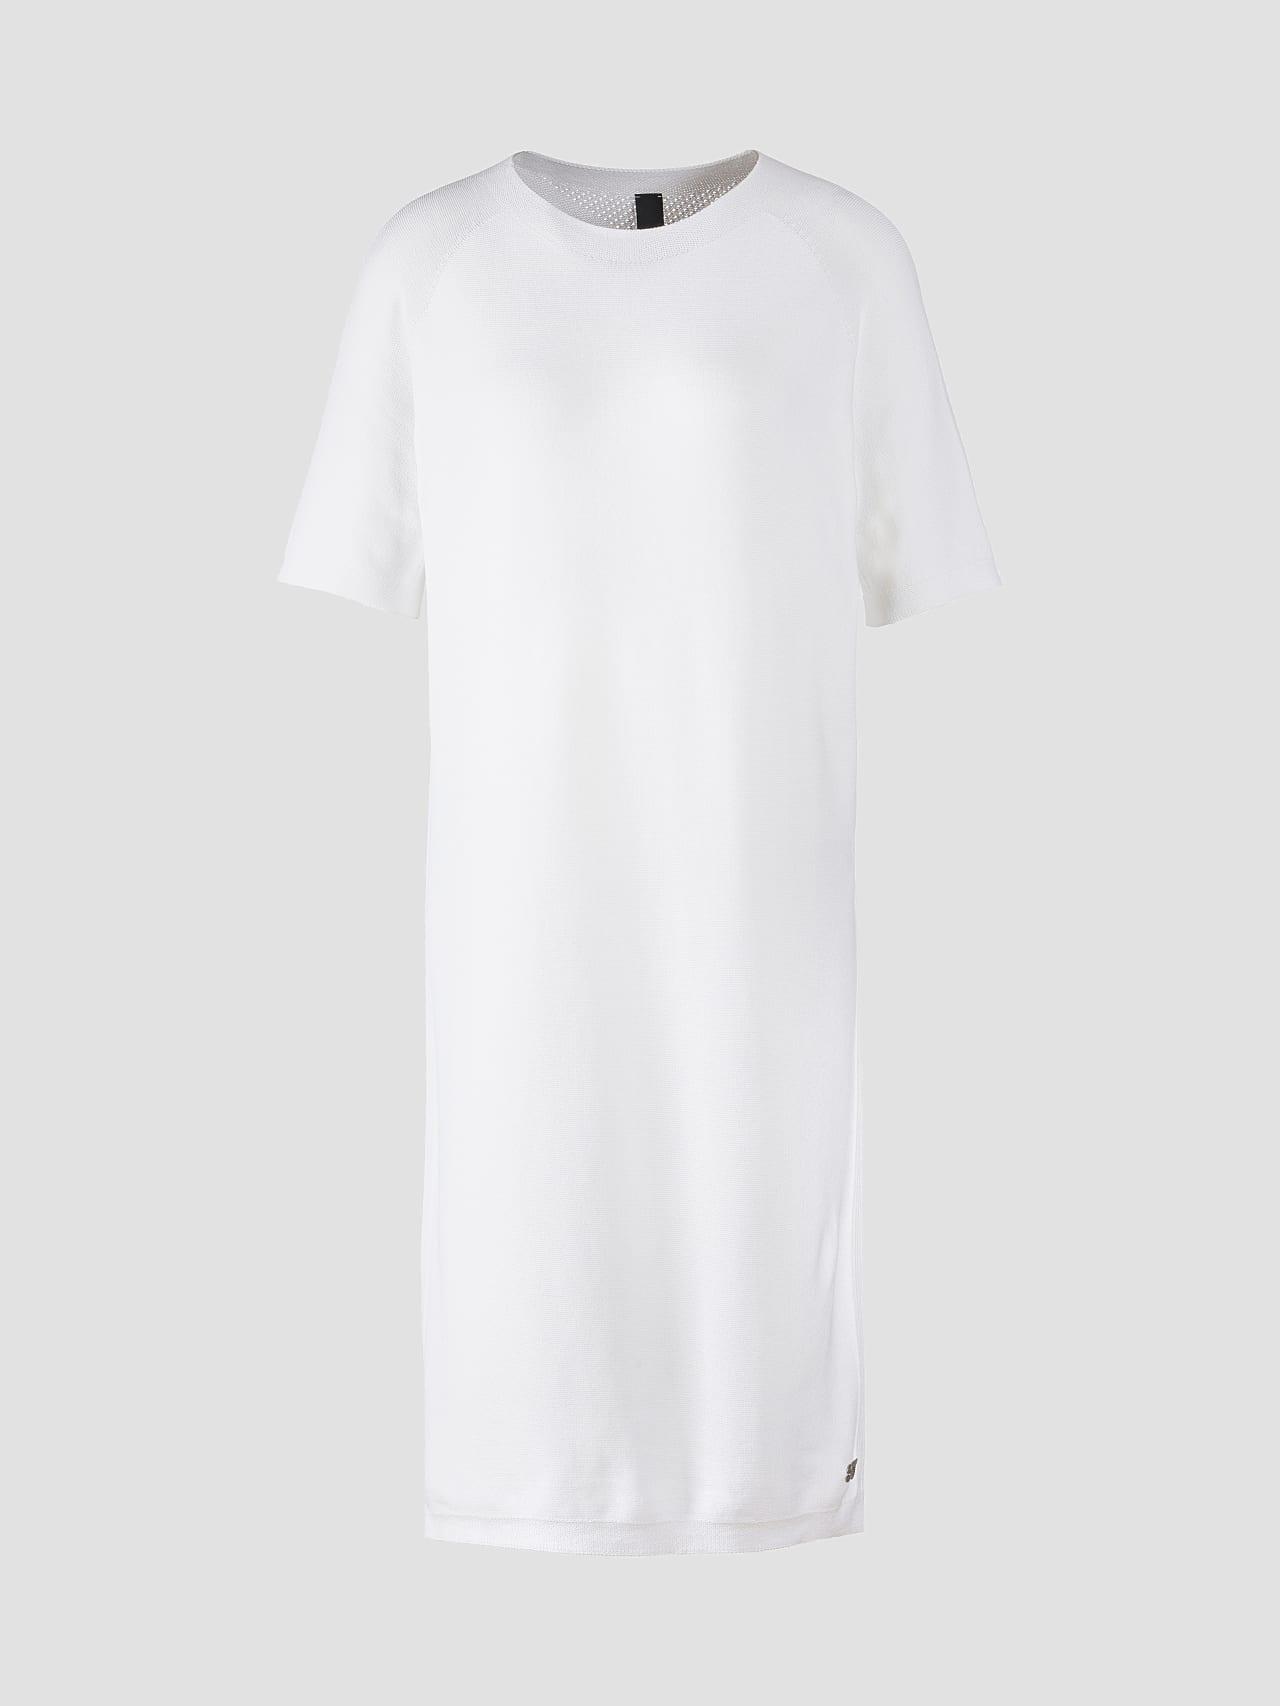 FZORF V1.Y5.01 Seamless Knit Dress white Back Alpha Tauri